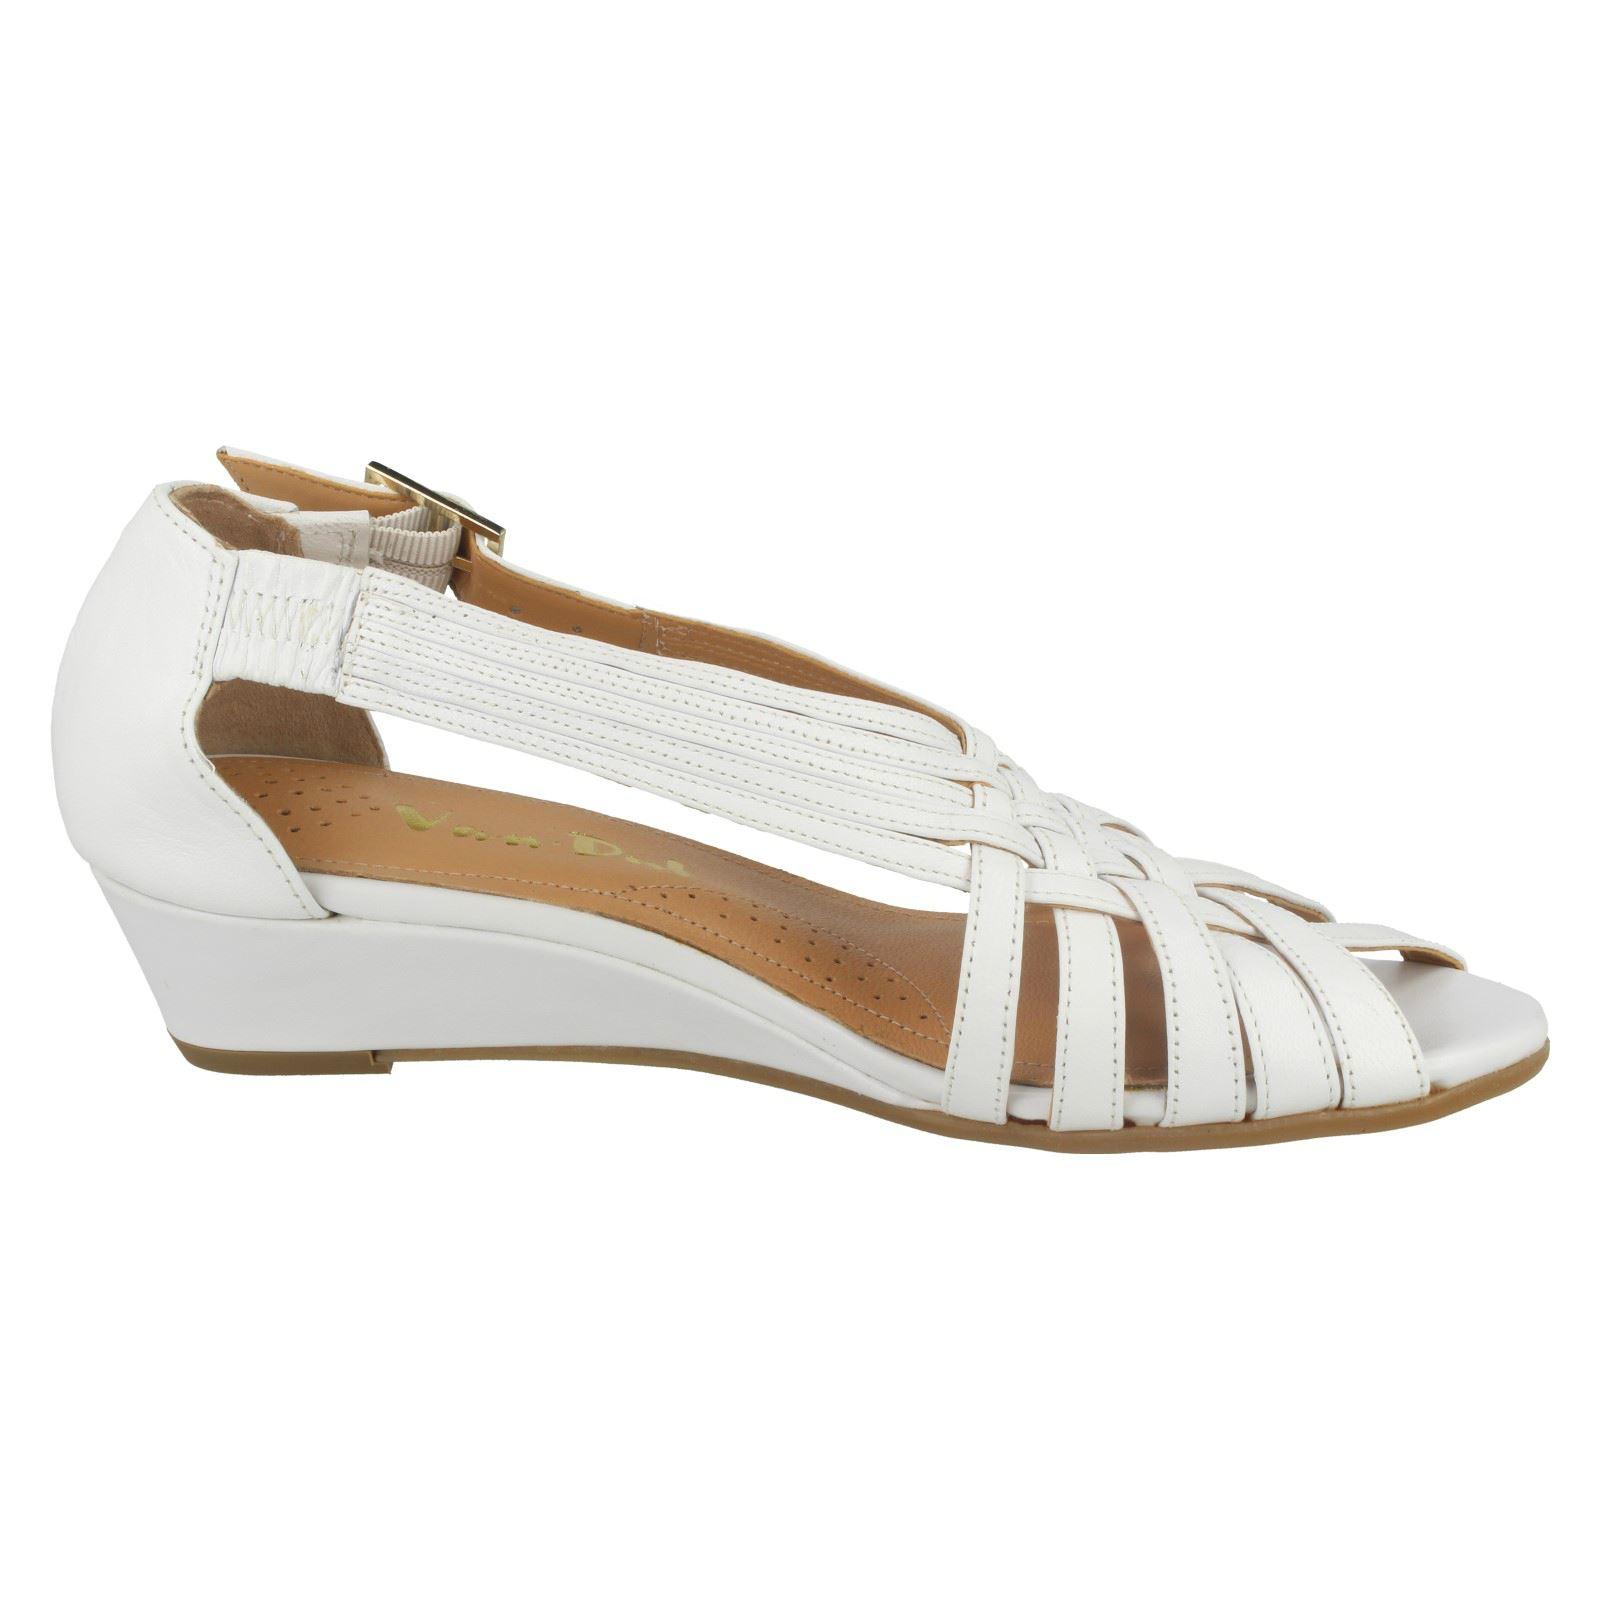 Ladies-Van-Dal-Wedge-Strappy-Sandals-Lucie thumbnail 12